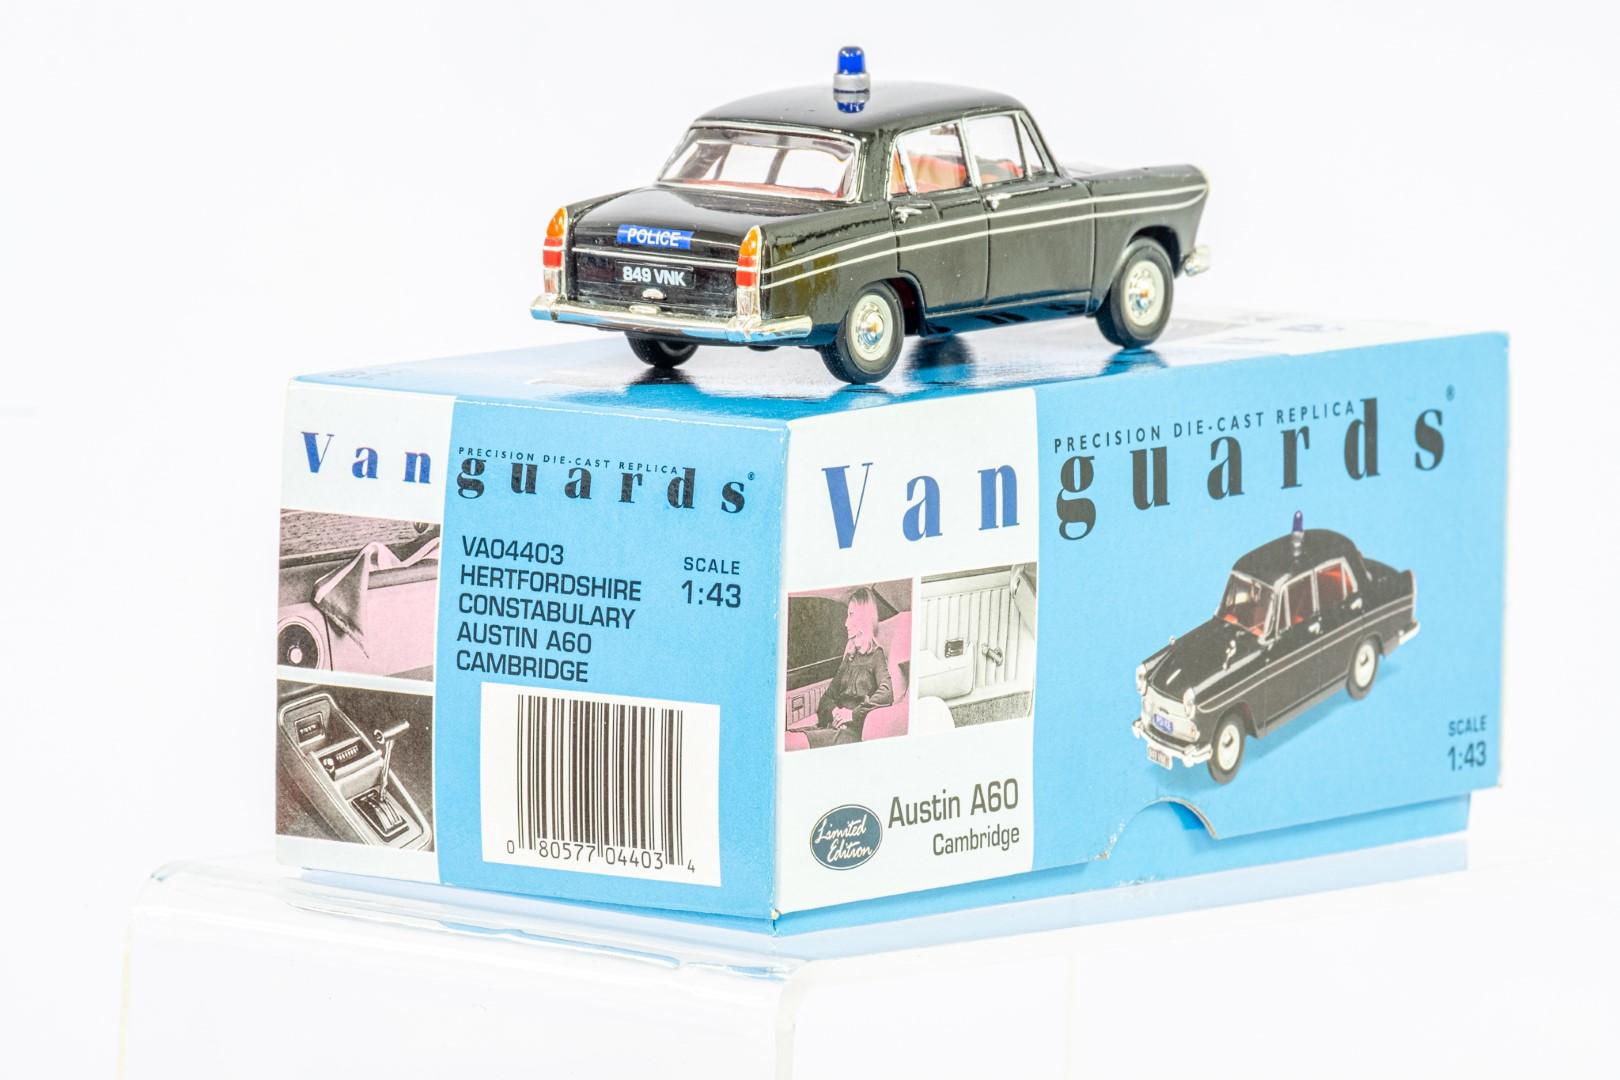 Vanguards Austin A60 Cambridge - Hertfordshire Police - Image 4 of 4